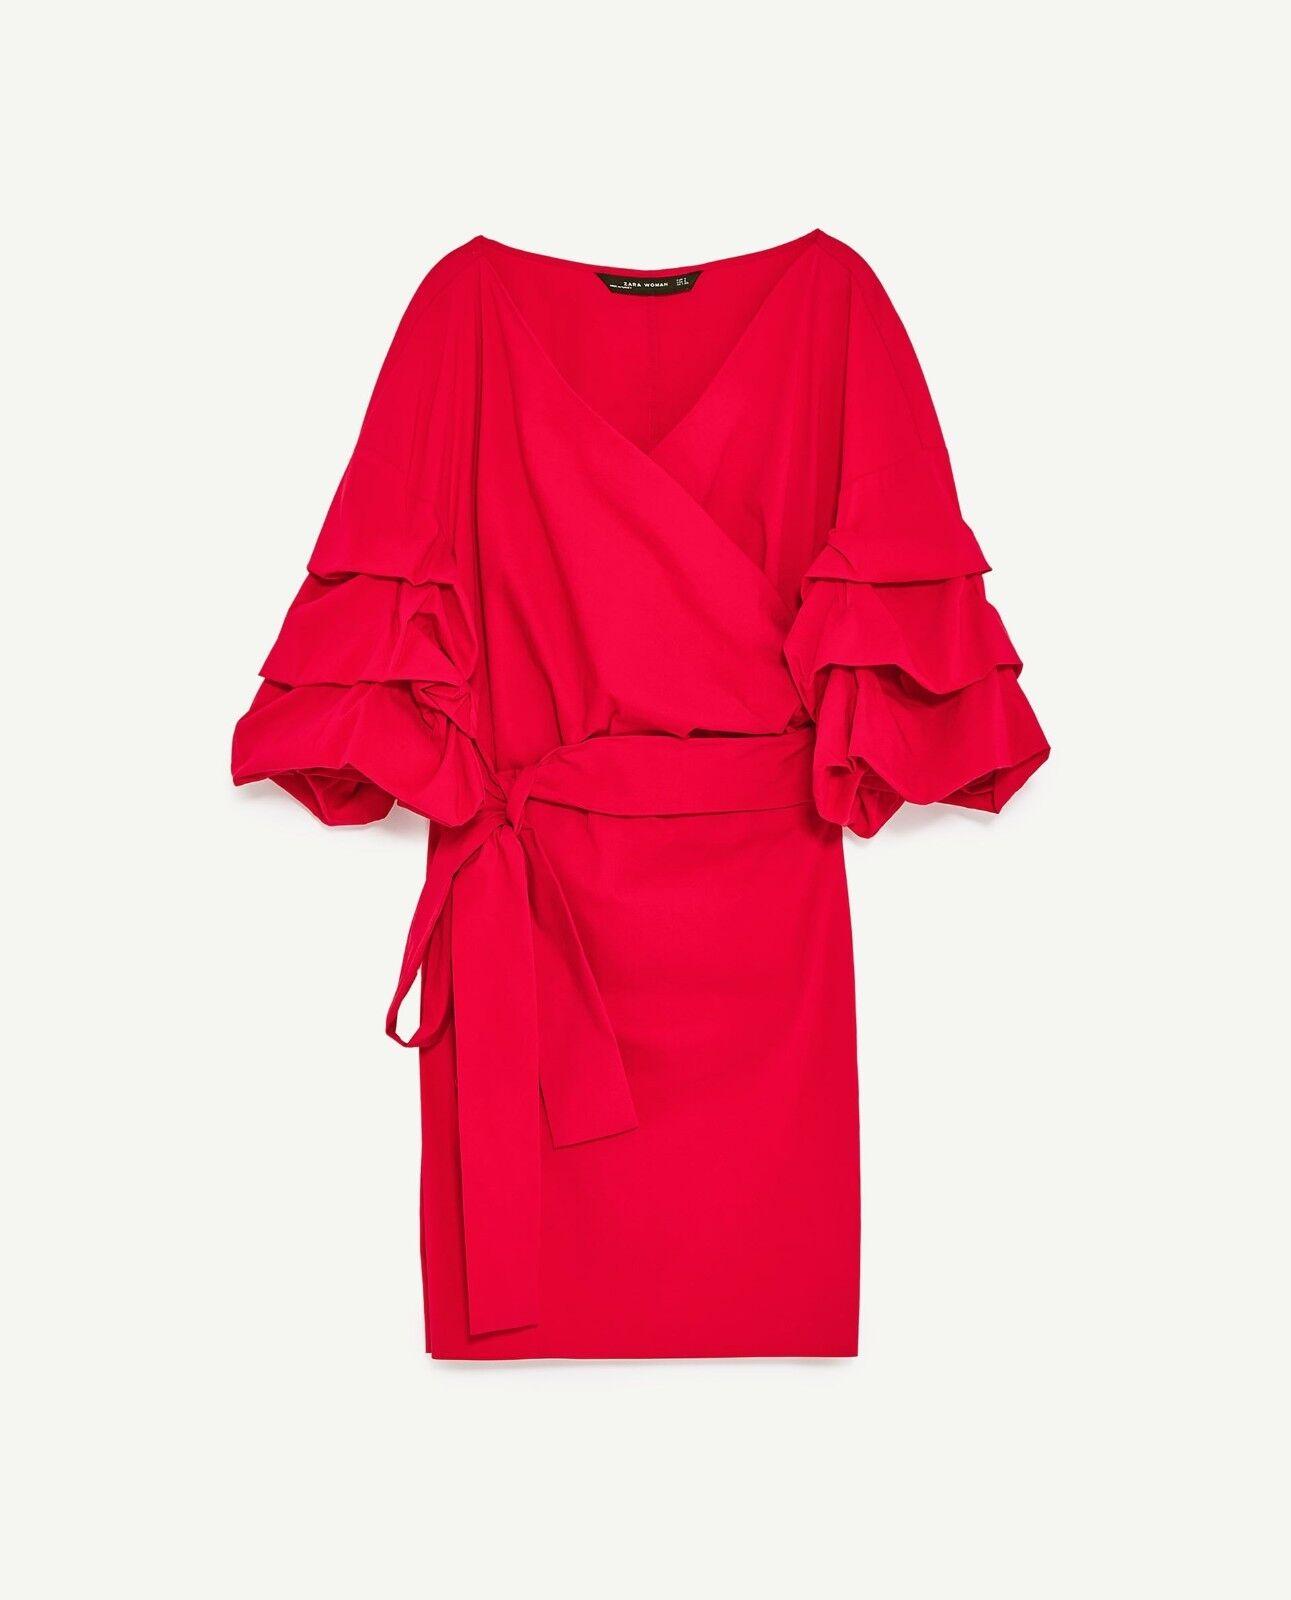 ZARA MINI DRESS WITH RUFFLED SLEEVES and sash belt-red-POPLIN-ref 4437 249-S, L